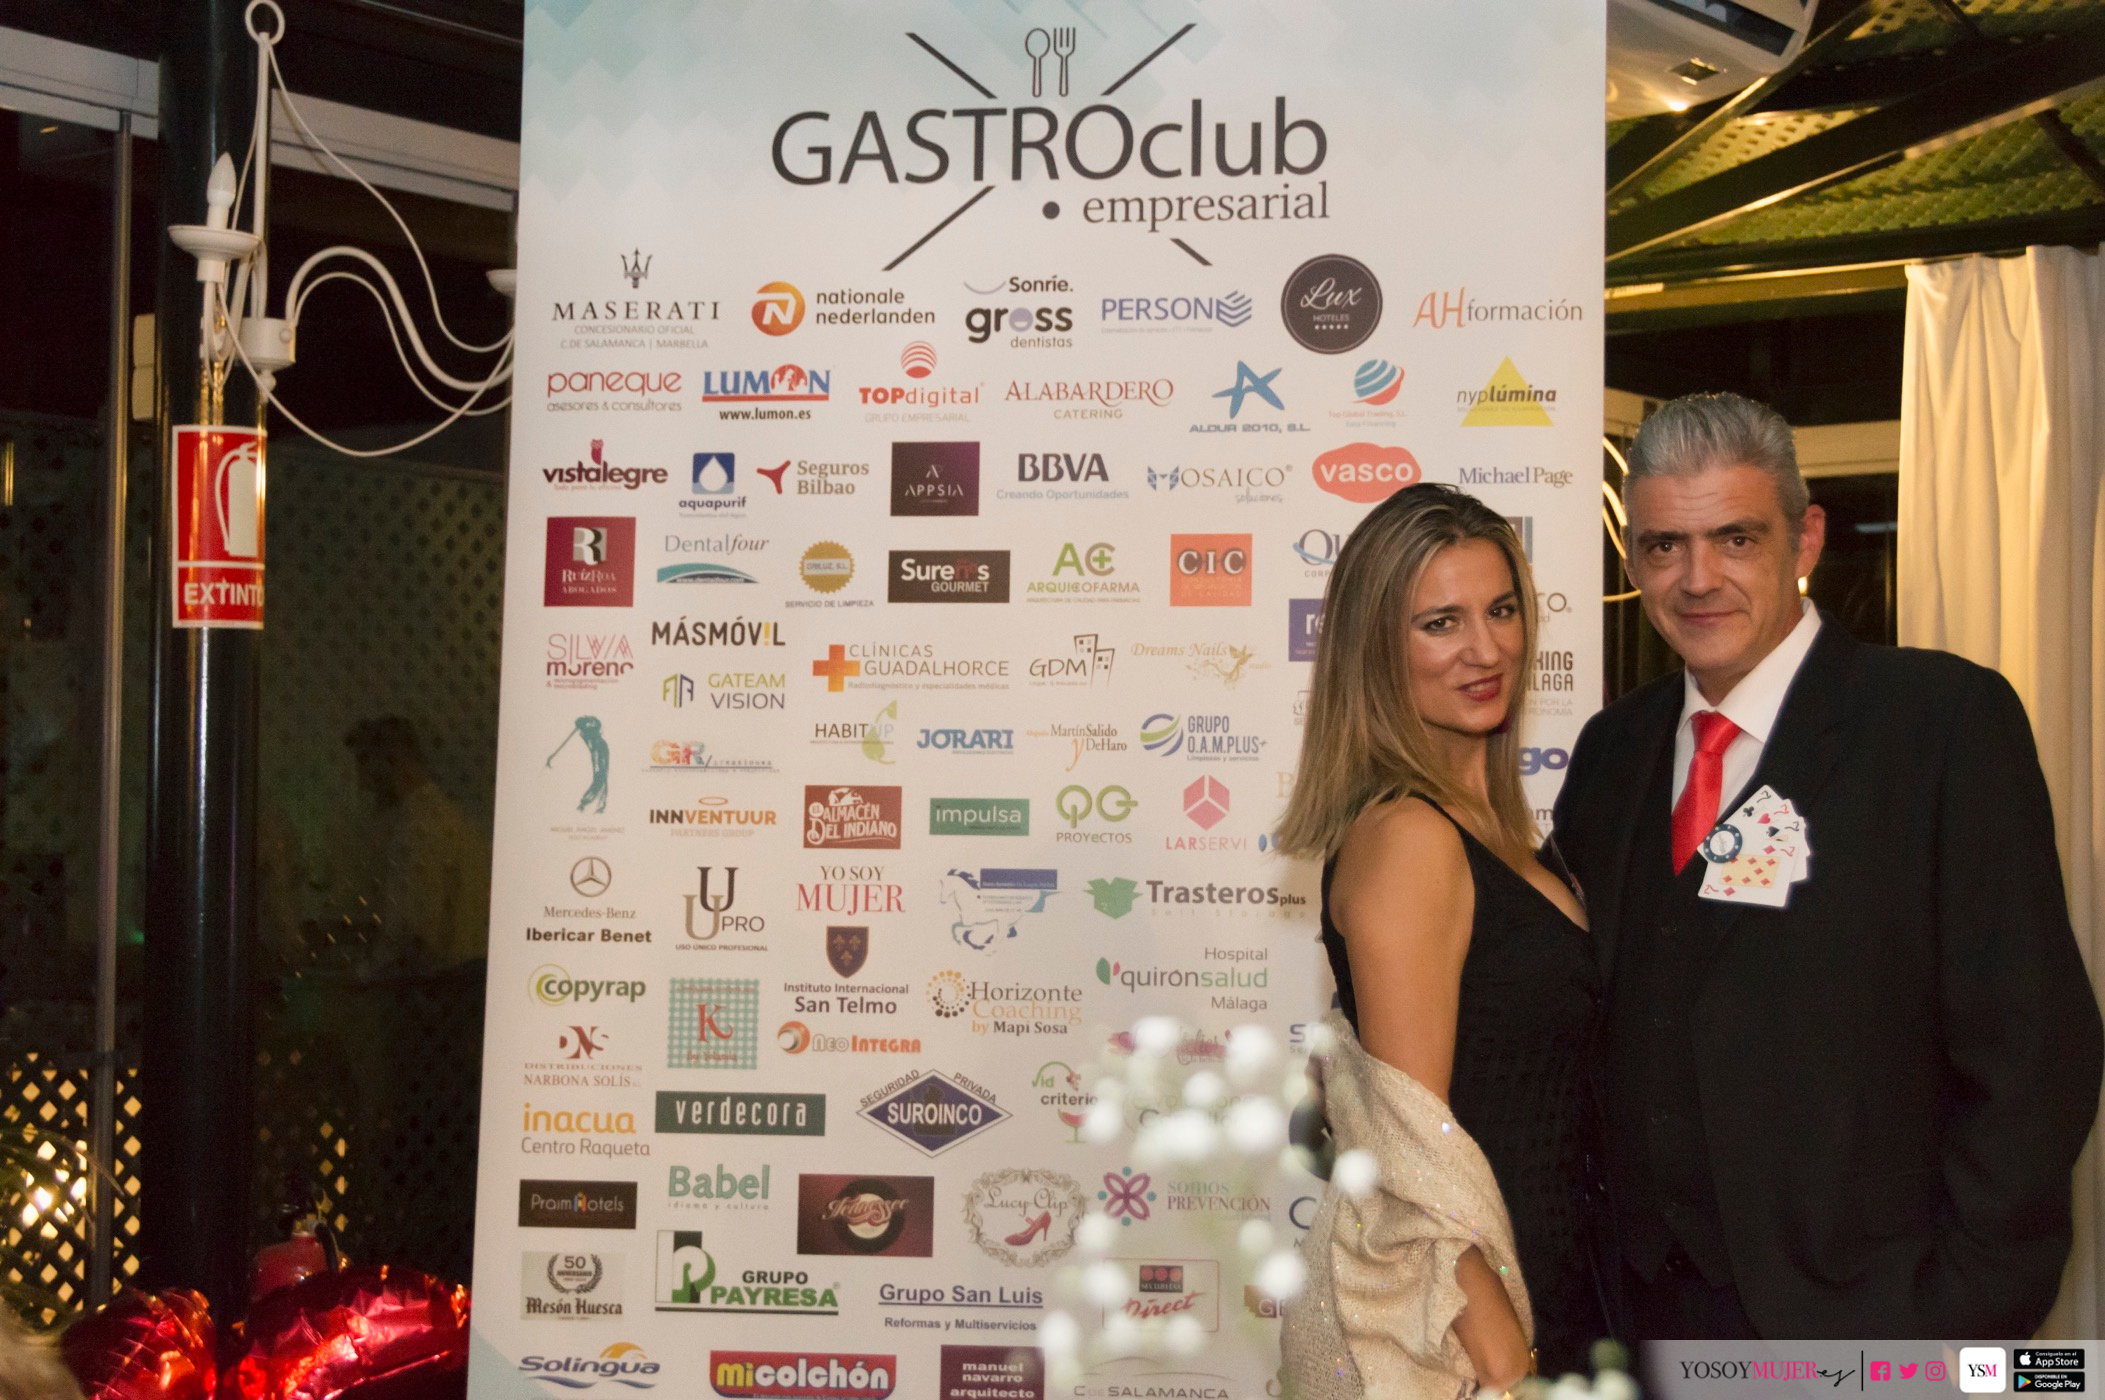 Gastroclub empresarial